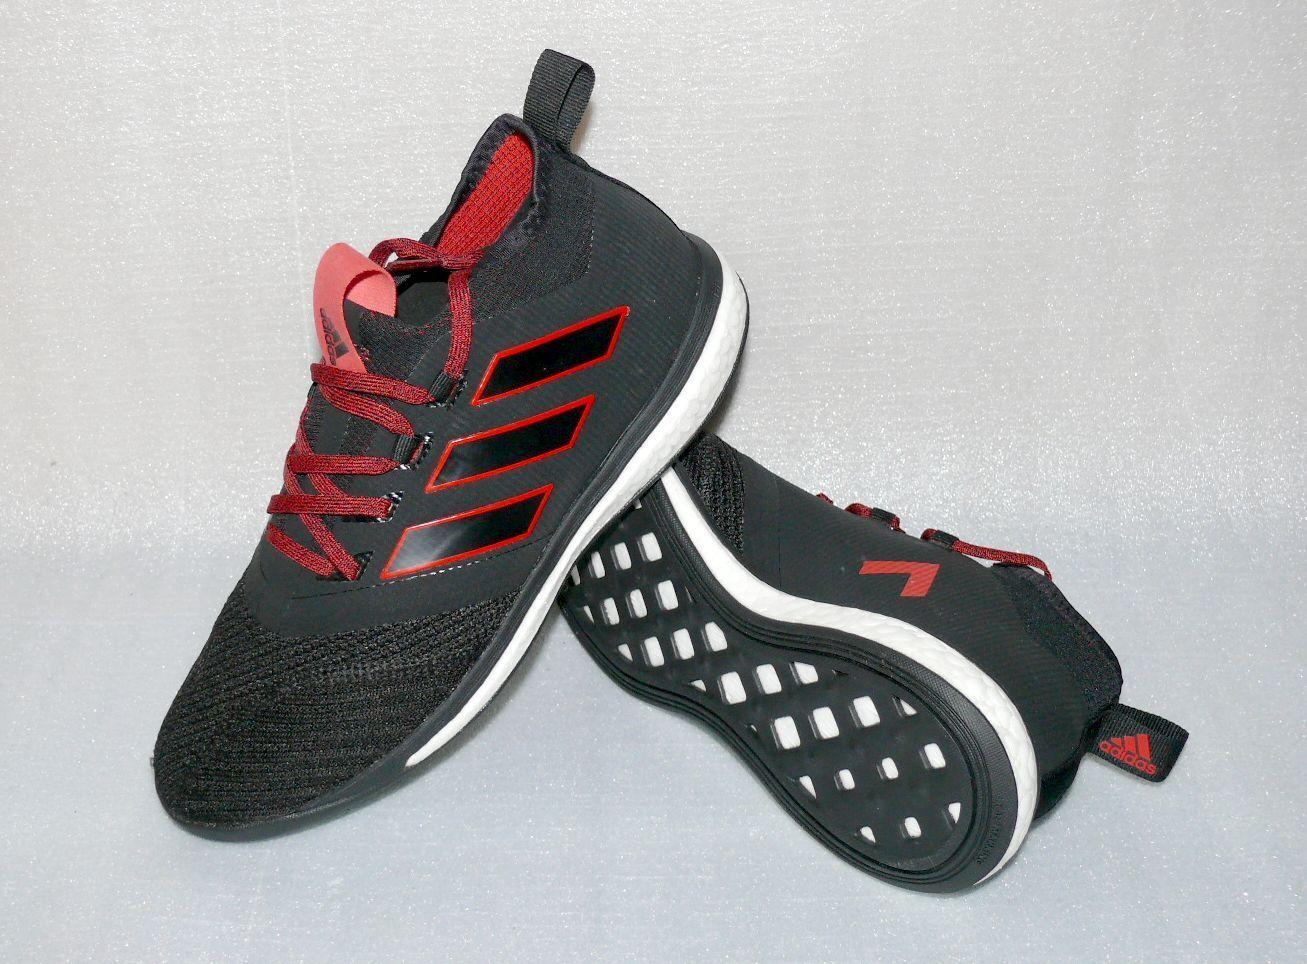 Adidas BA4431 ACE TANGO 17.1 Herren Schuhe Sport Turnschuhe 41 1 3 US 8 Schwarz Rot